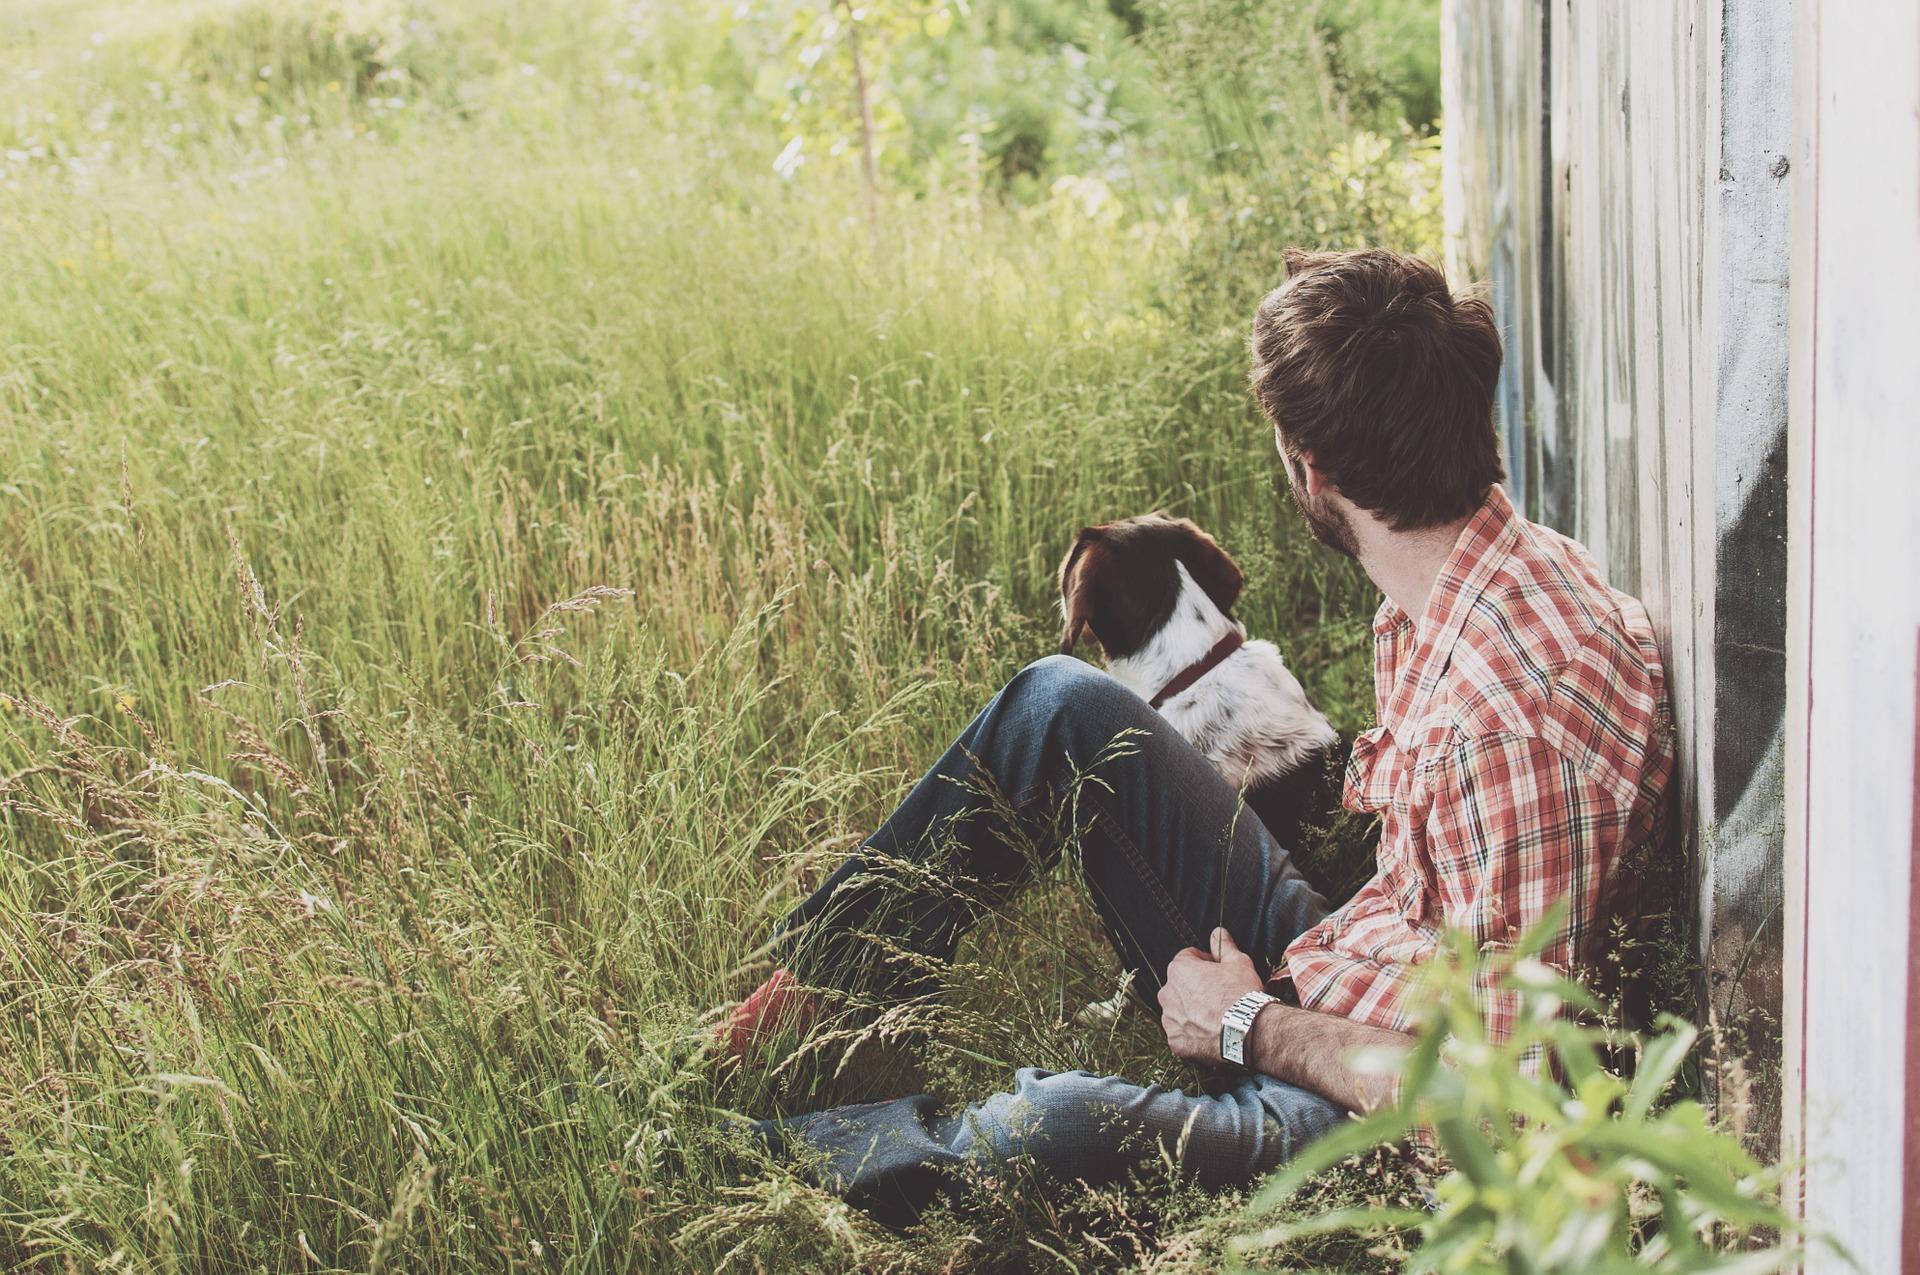 pensiero canino ed empatia